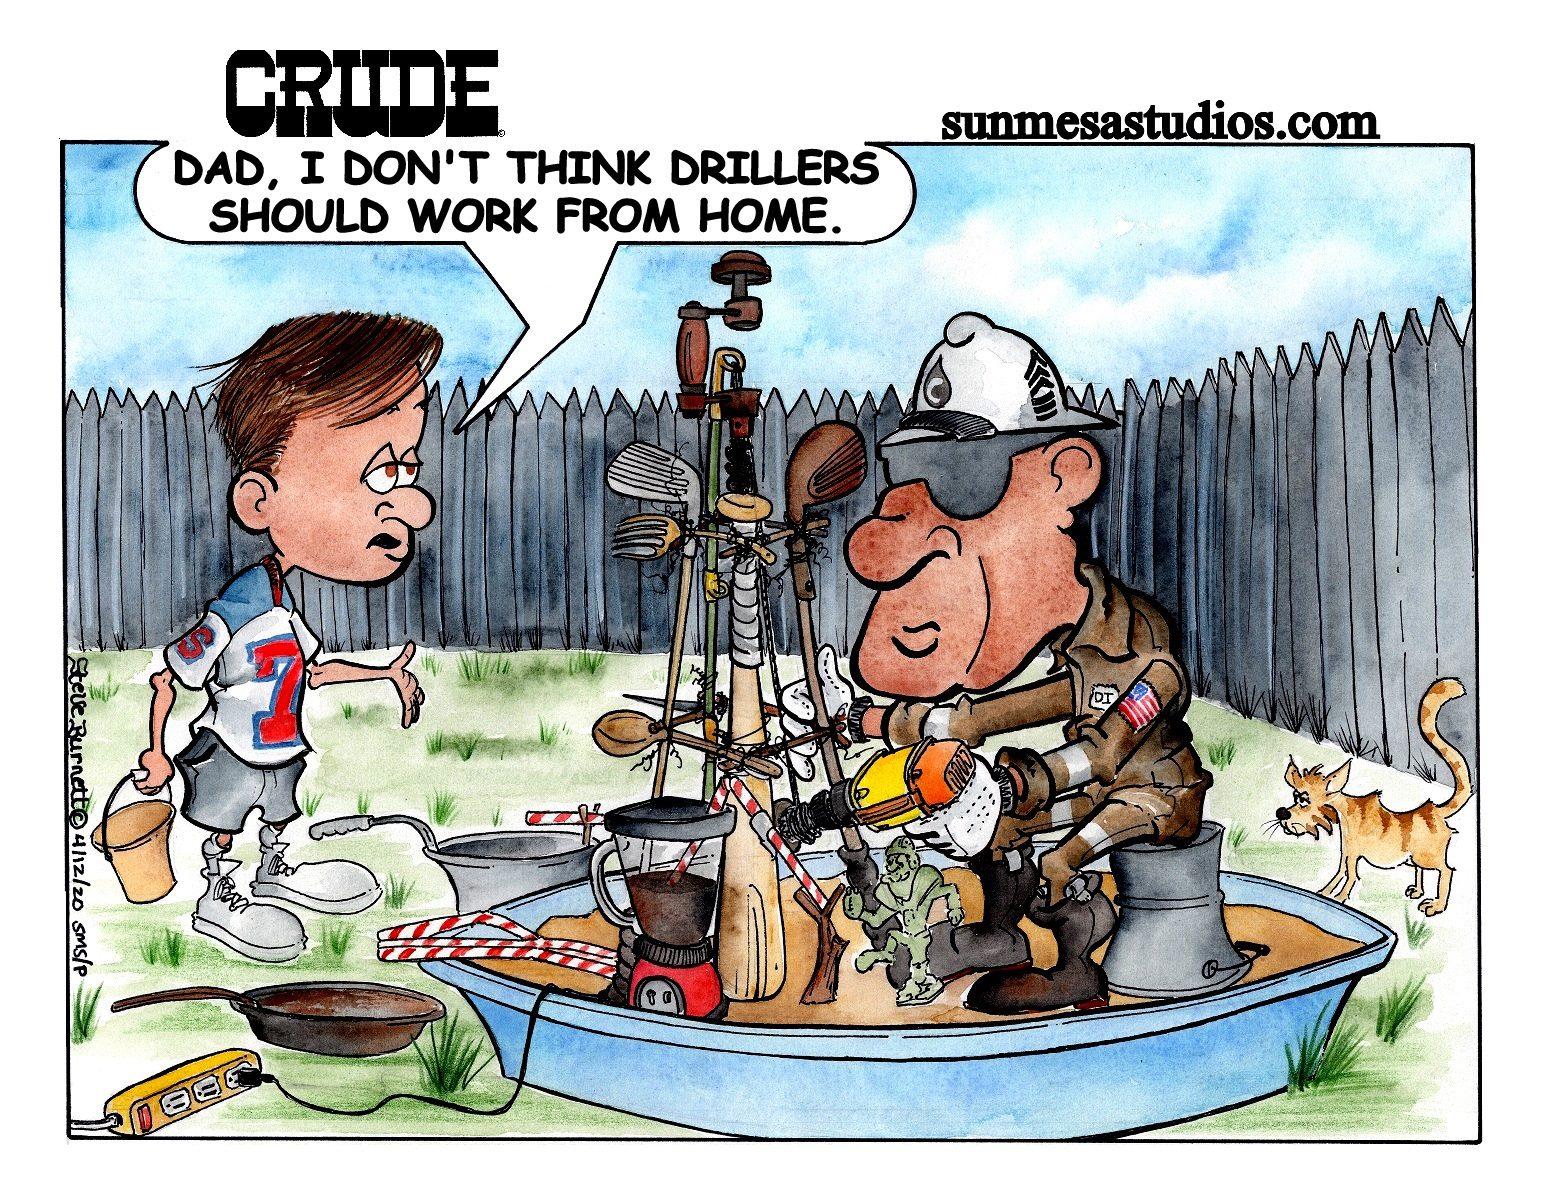 Work Home Driller